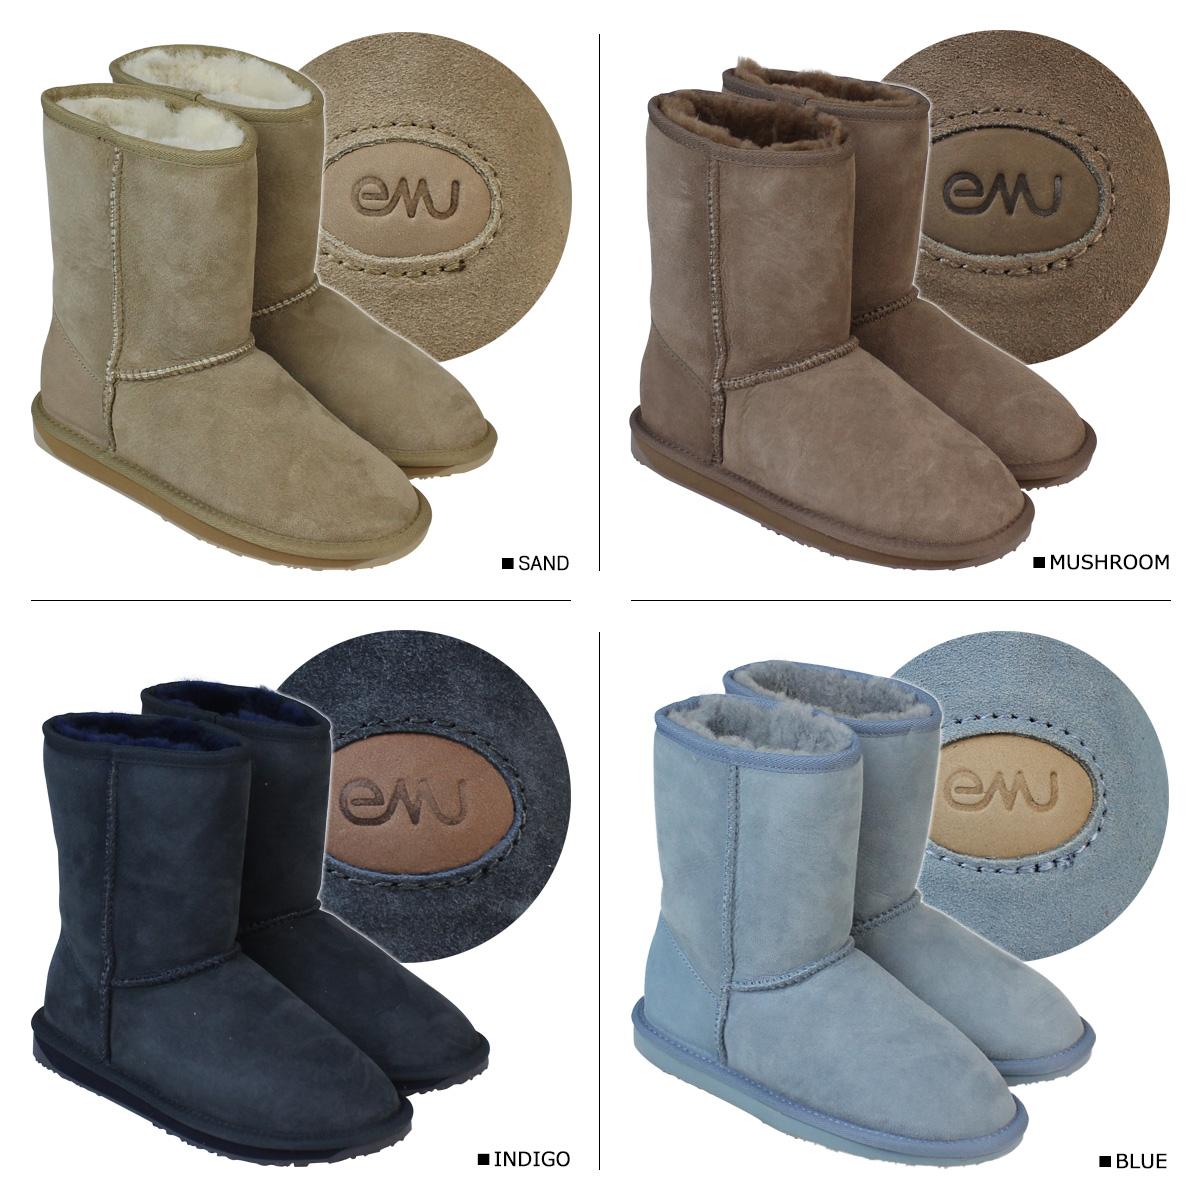 a1069923c590 EMU EMU Stinger Lo Sheepskin boots W10002 STINGER LO Sheepskin Womens mens  boots